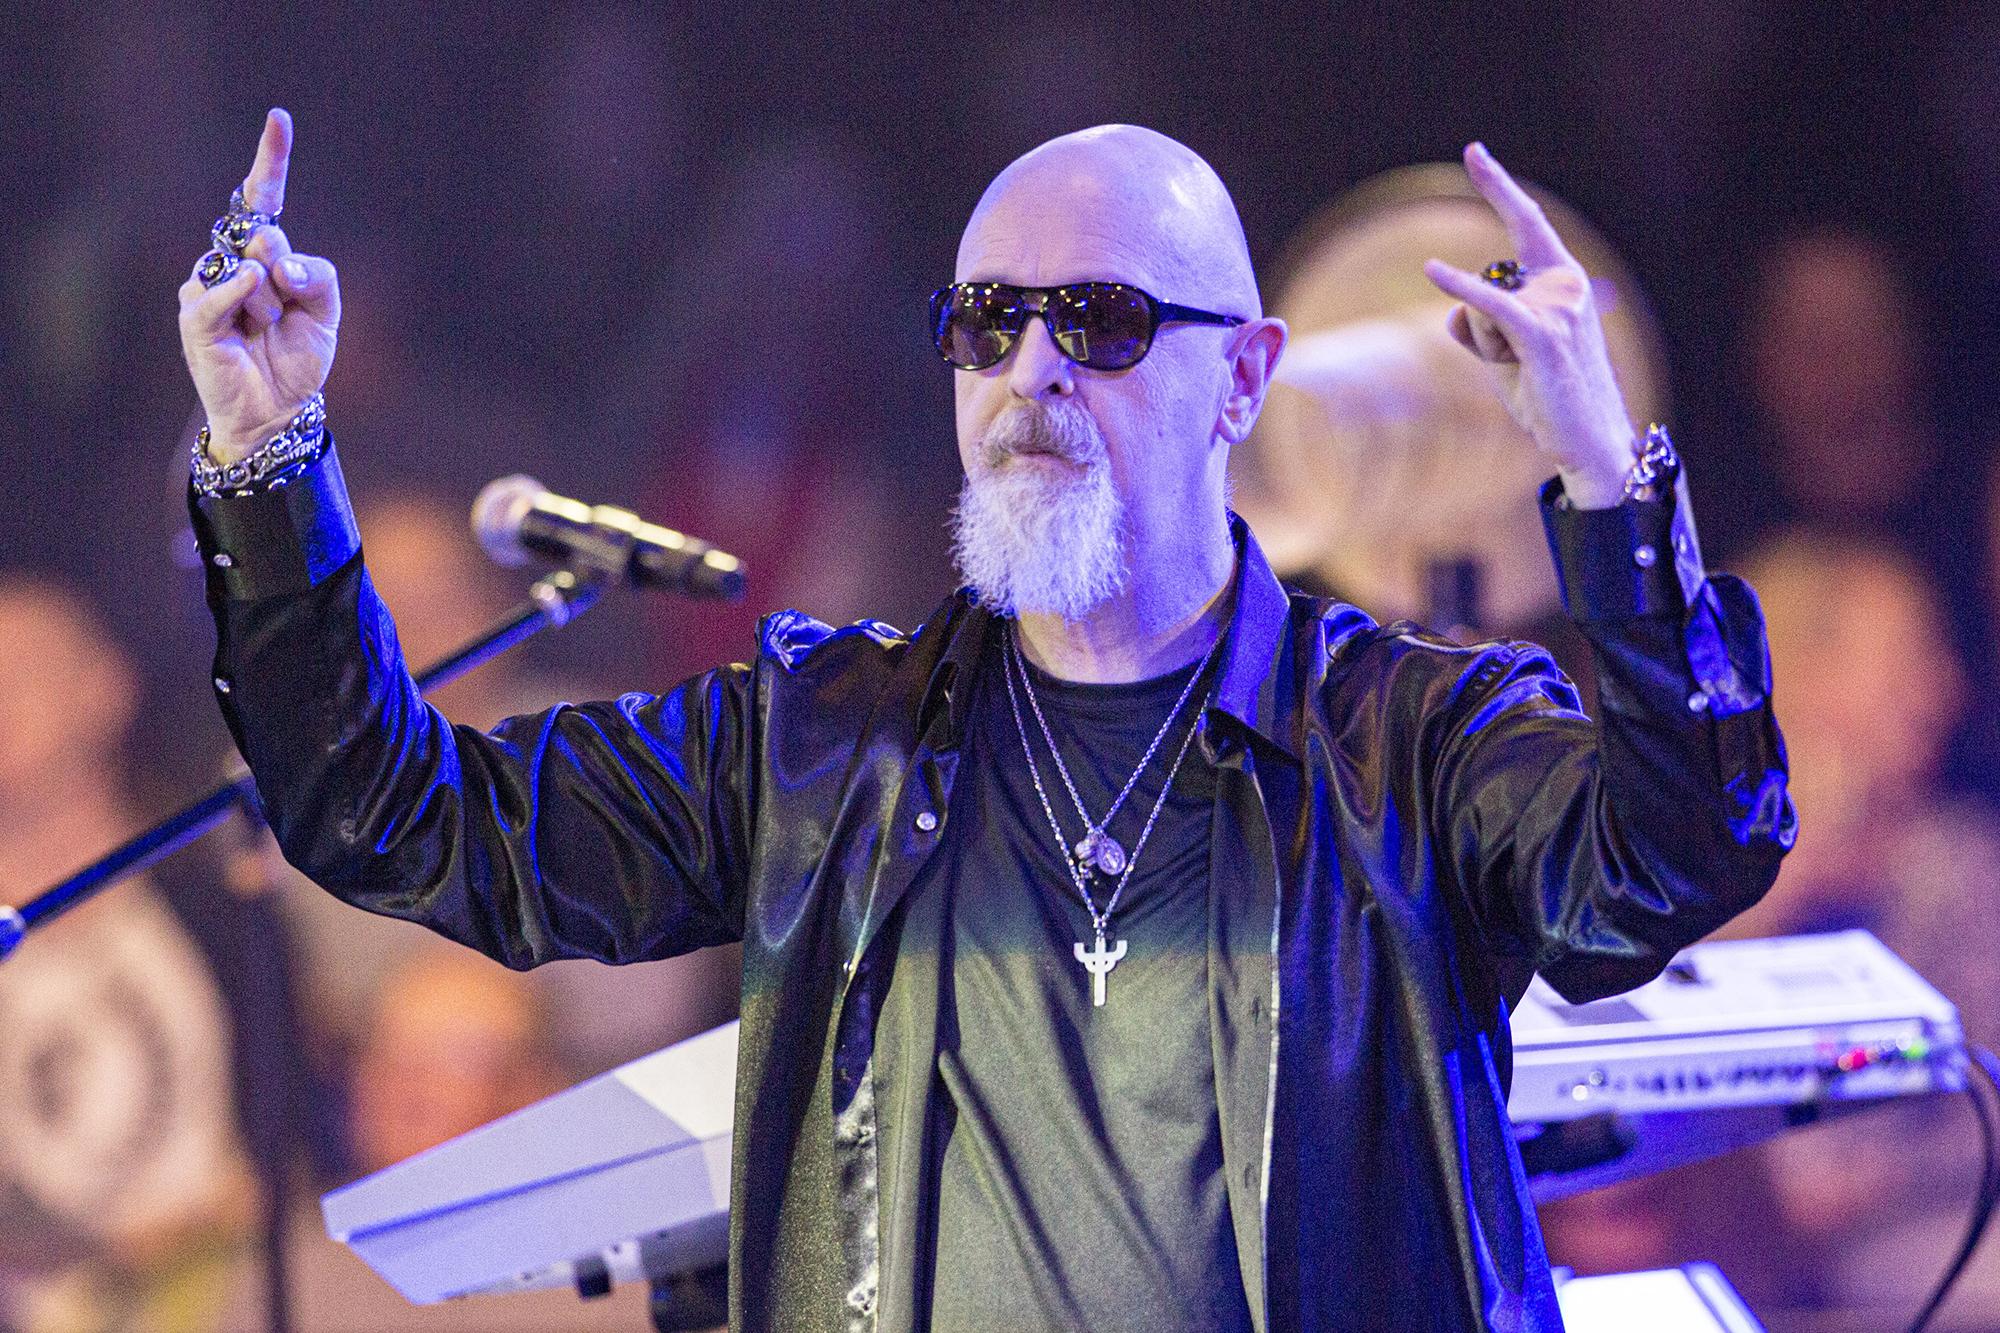 Judas Priest's Rob Halford on public-sex arrest: 'I've f–ked up!'